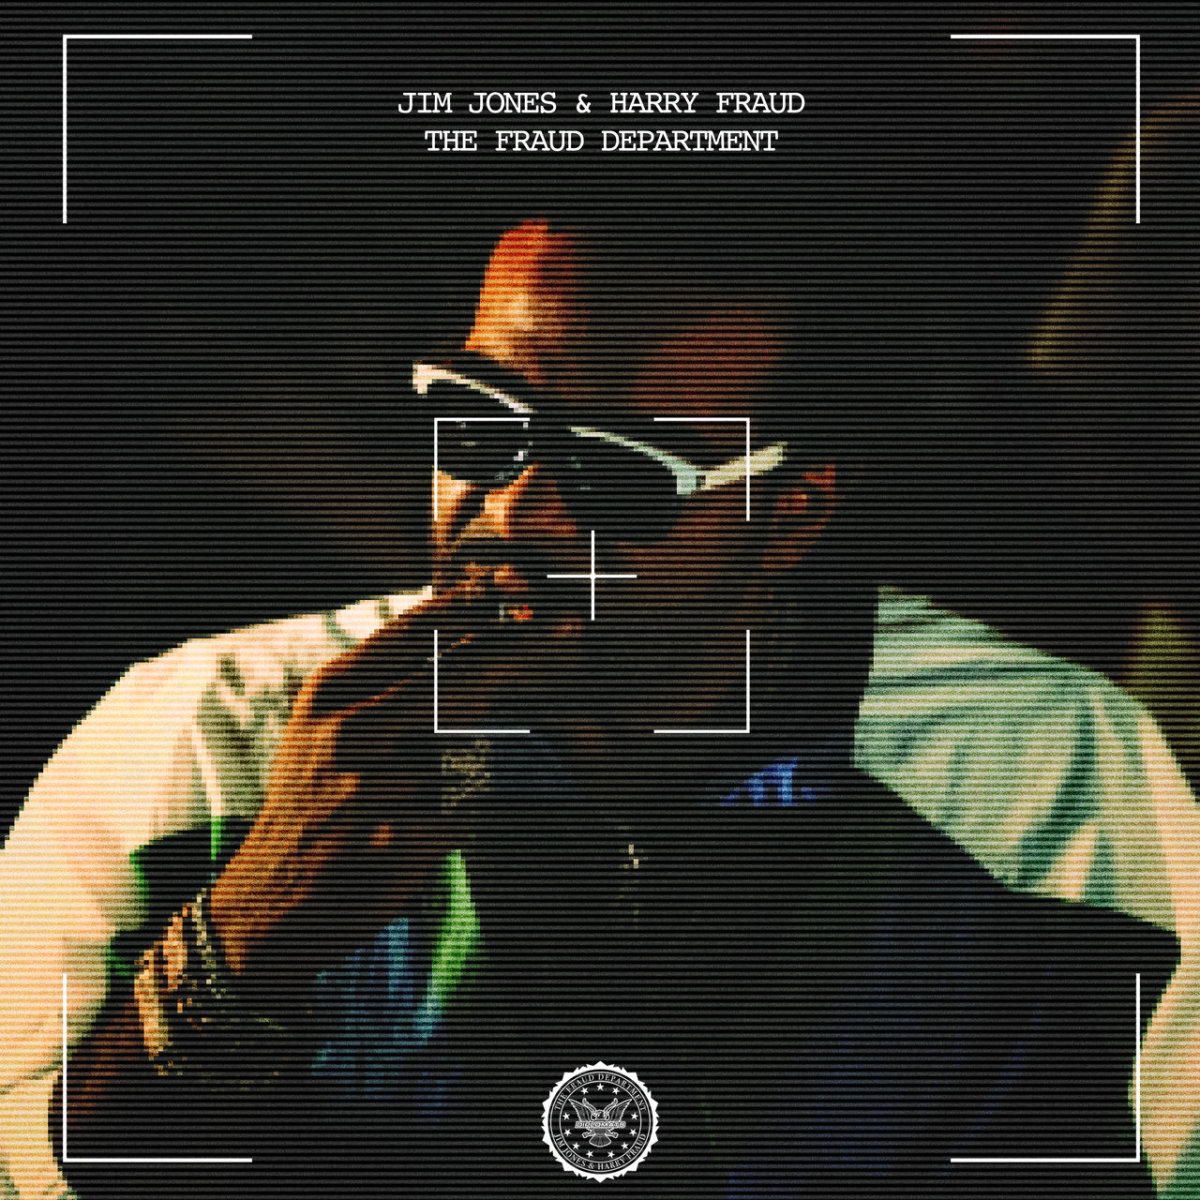 Jim Jones and Harry Fraud Release 'The Fraud Department' Album | Complex